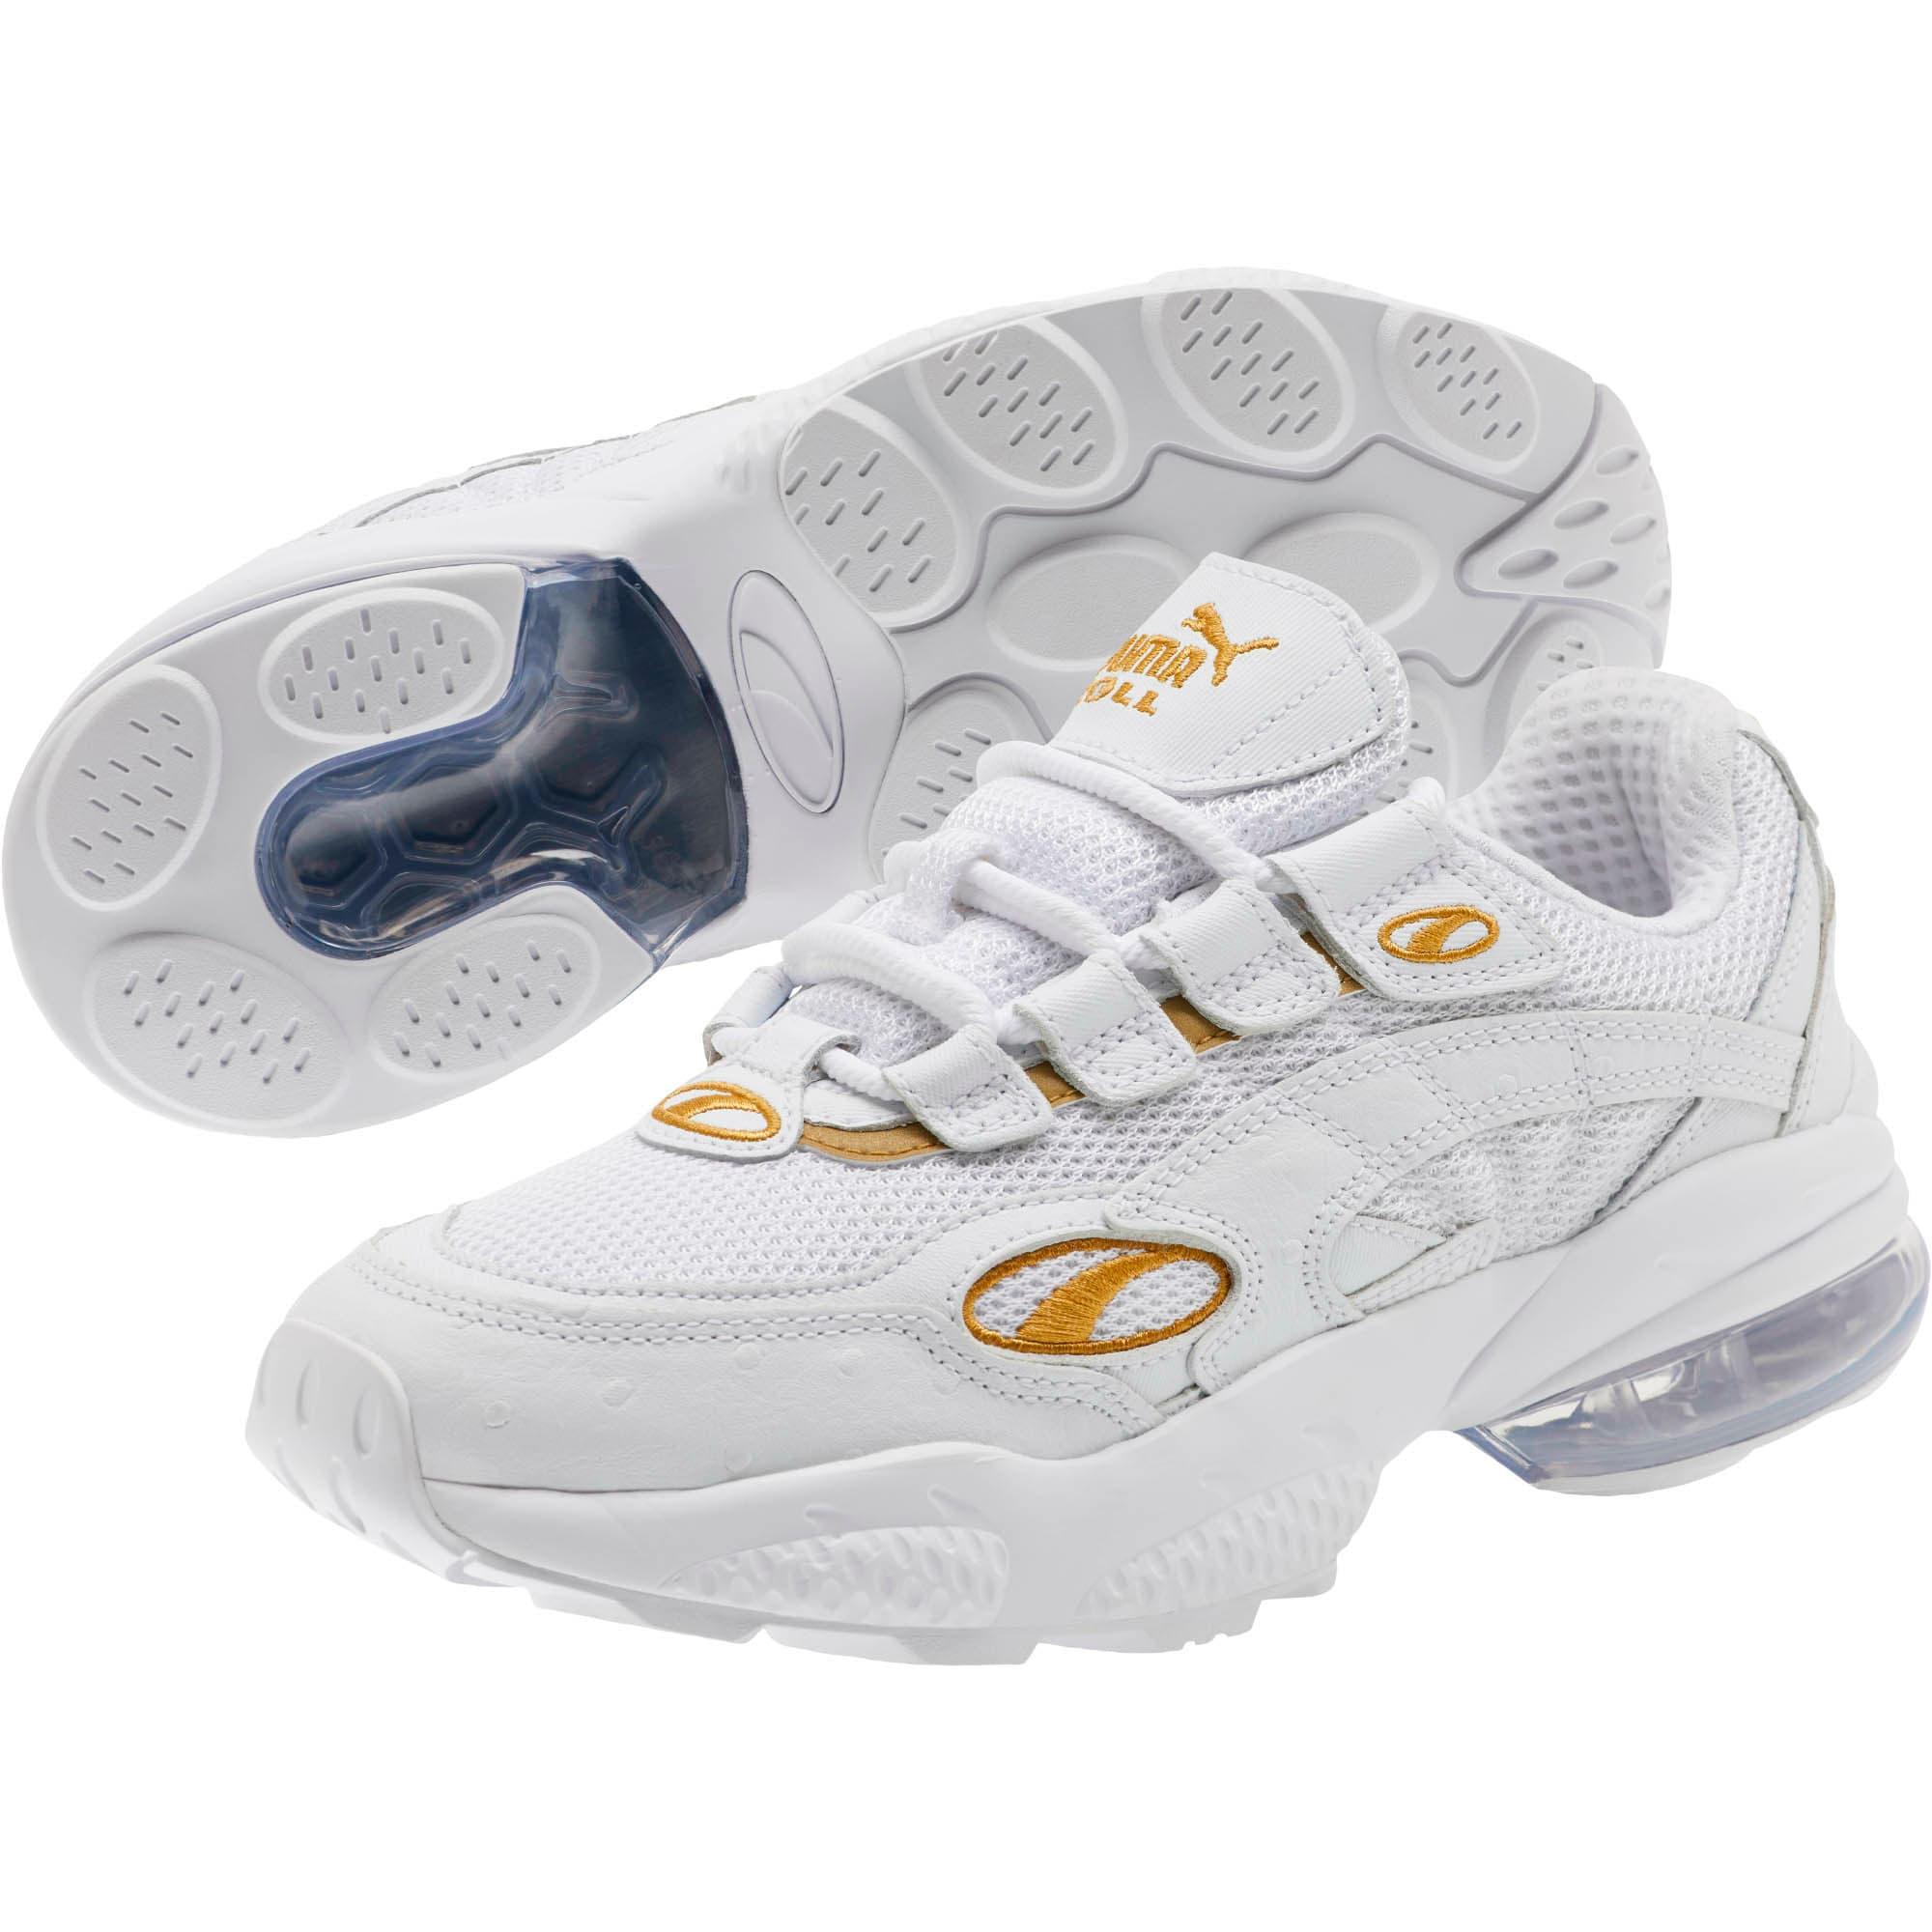 Thumbnail 2 of CELL Venom WO Women's Sneakers, Puma White-Puma Team Gold, medium